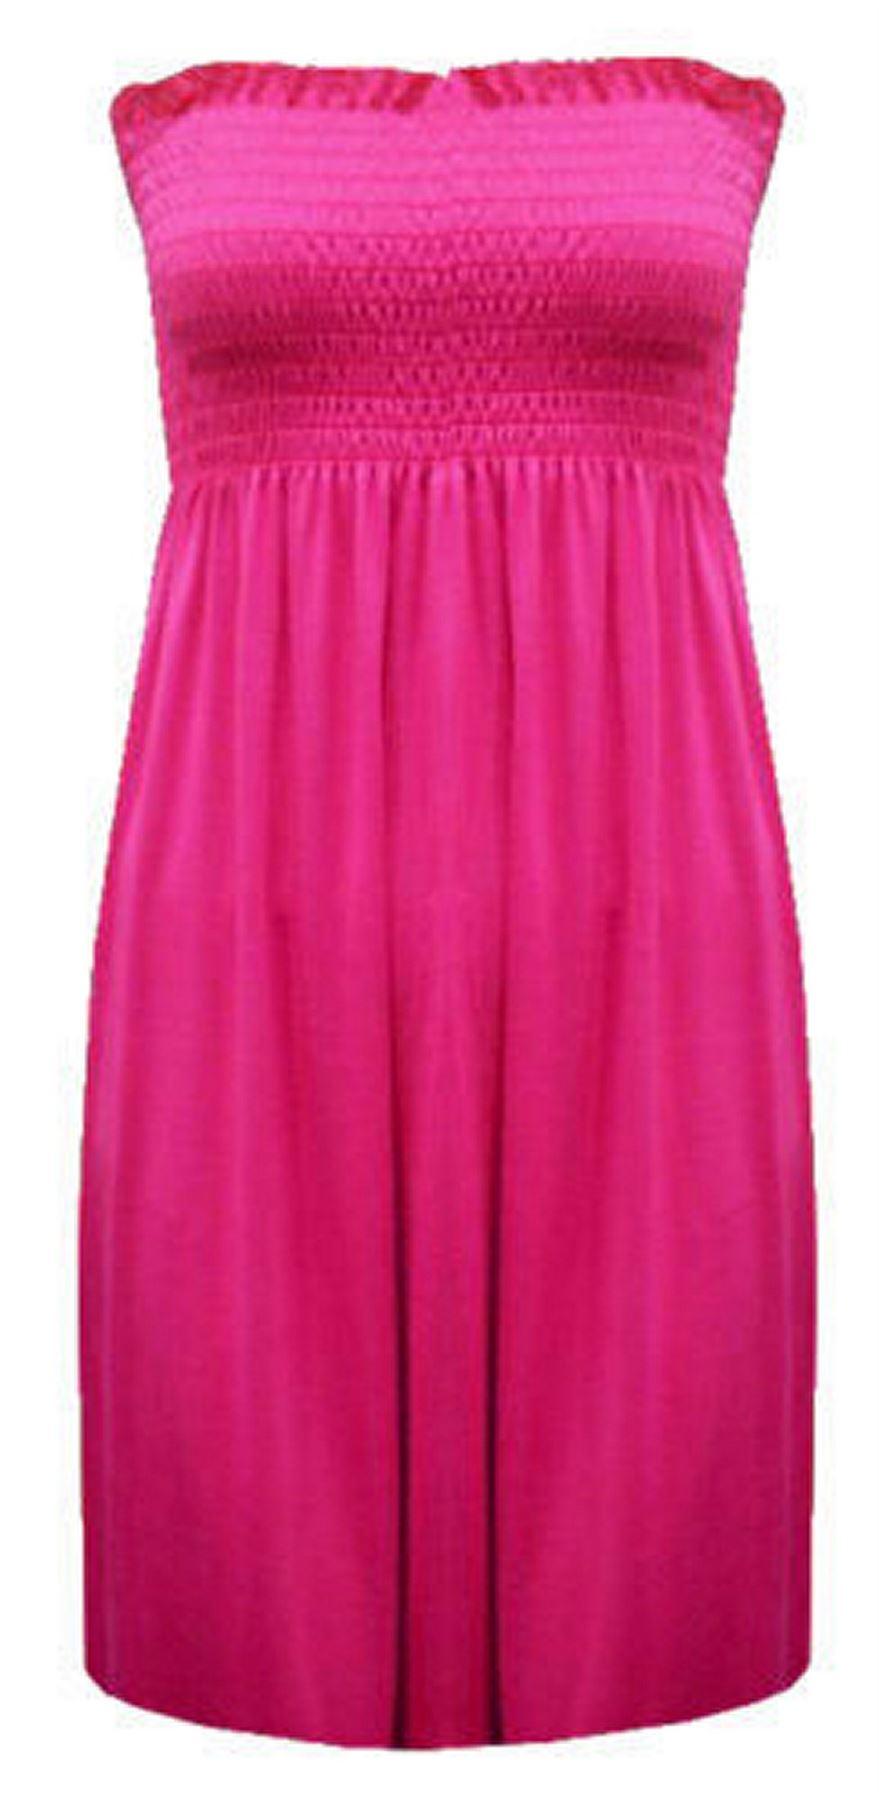 New-Ladies-Bandeau-Boob-Gathering-Tops-Boob-Tube-Beach-Wear-Tunics-8-26 thumbnail 19